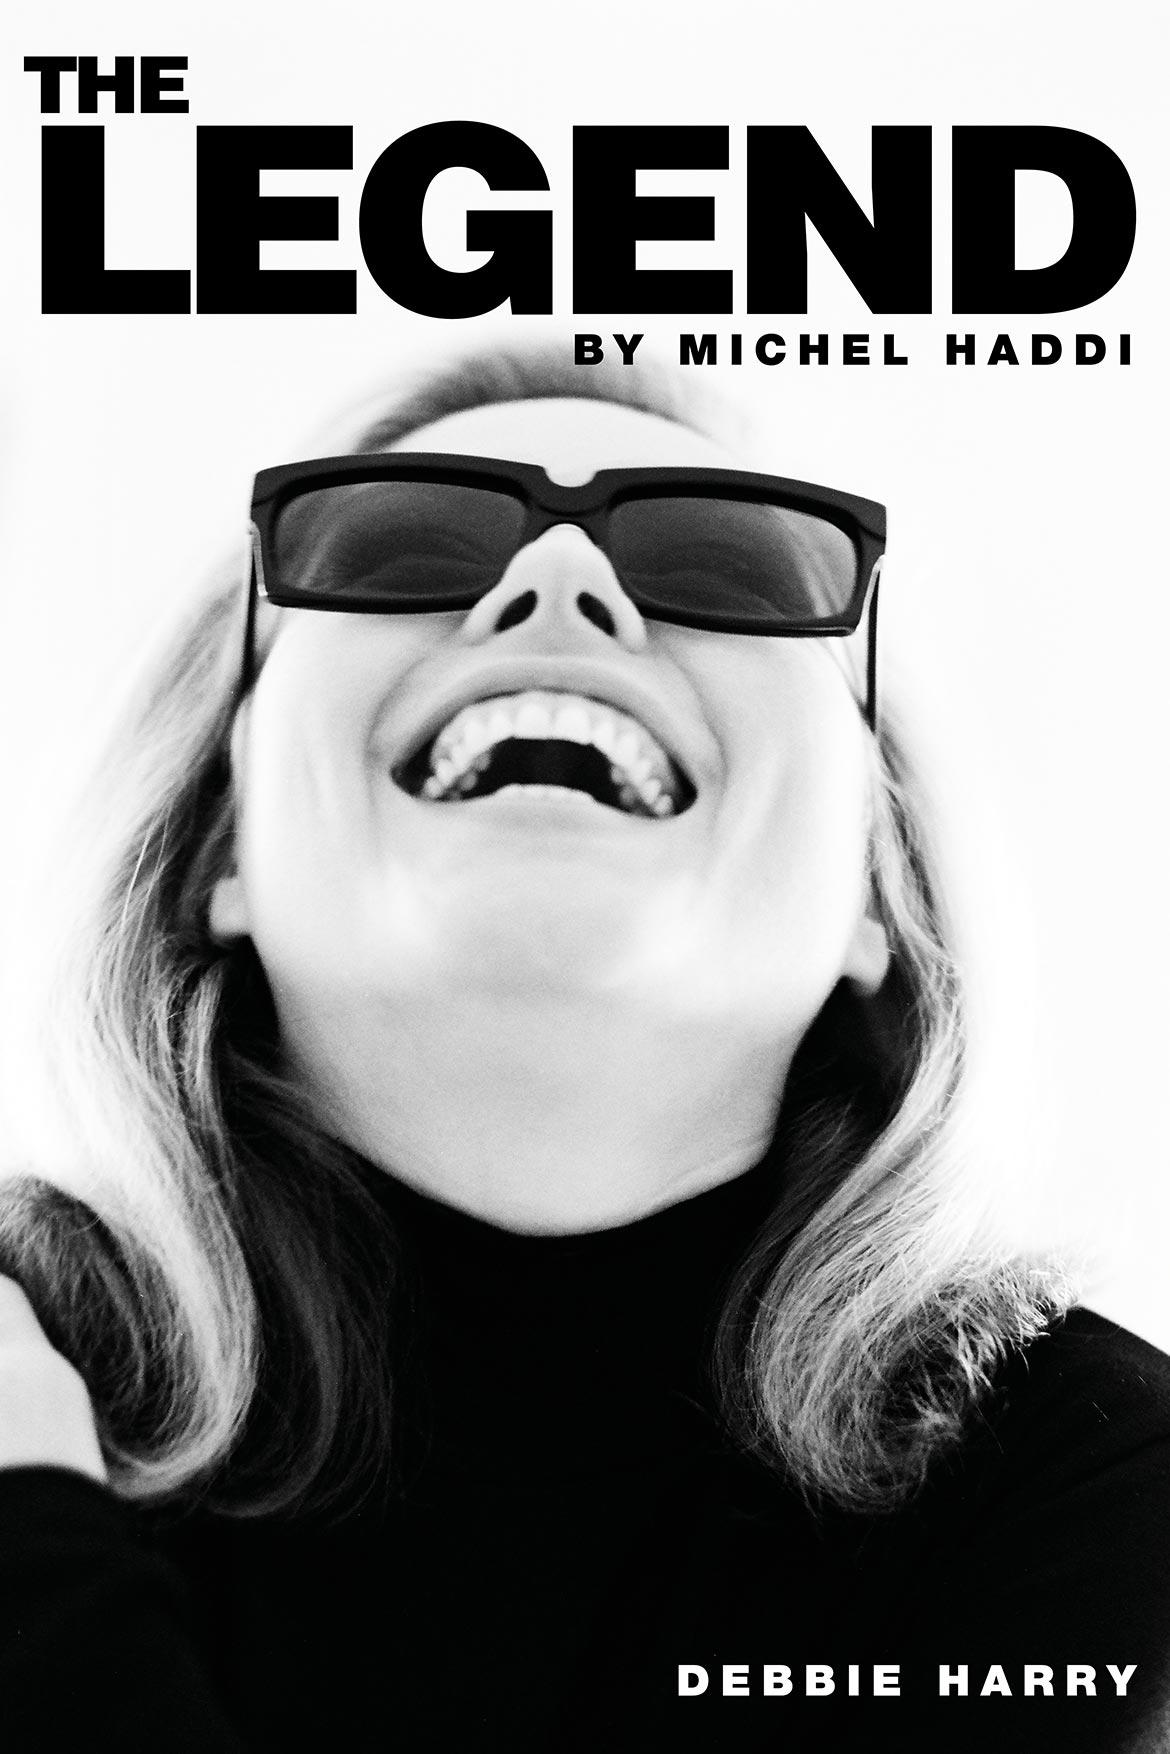 The Legend by Michel Haddi